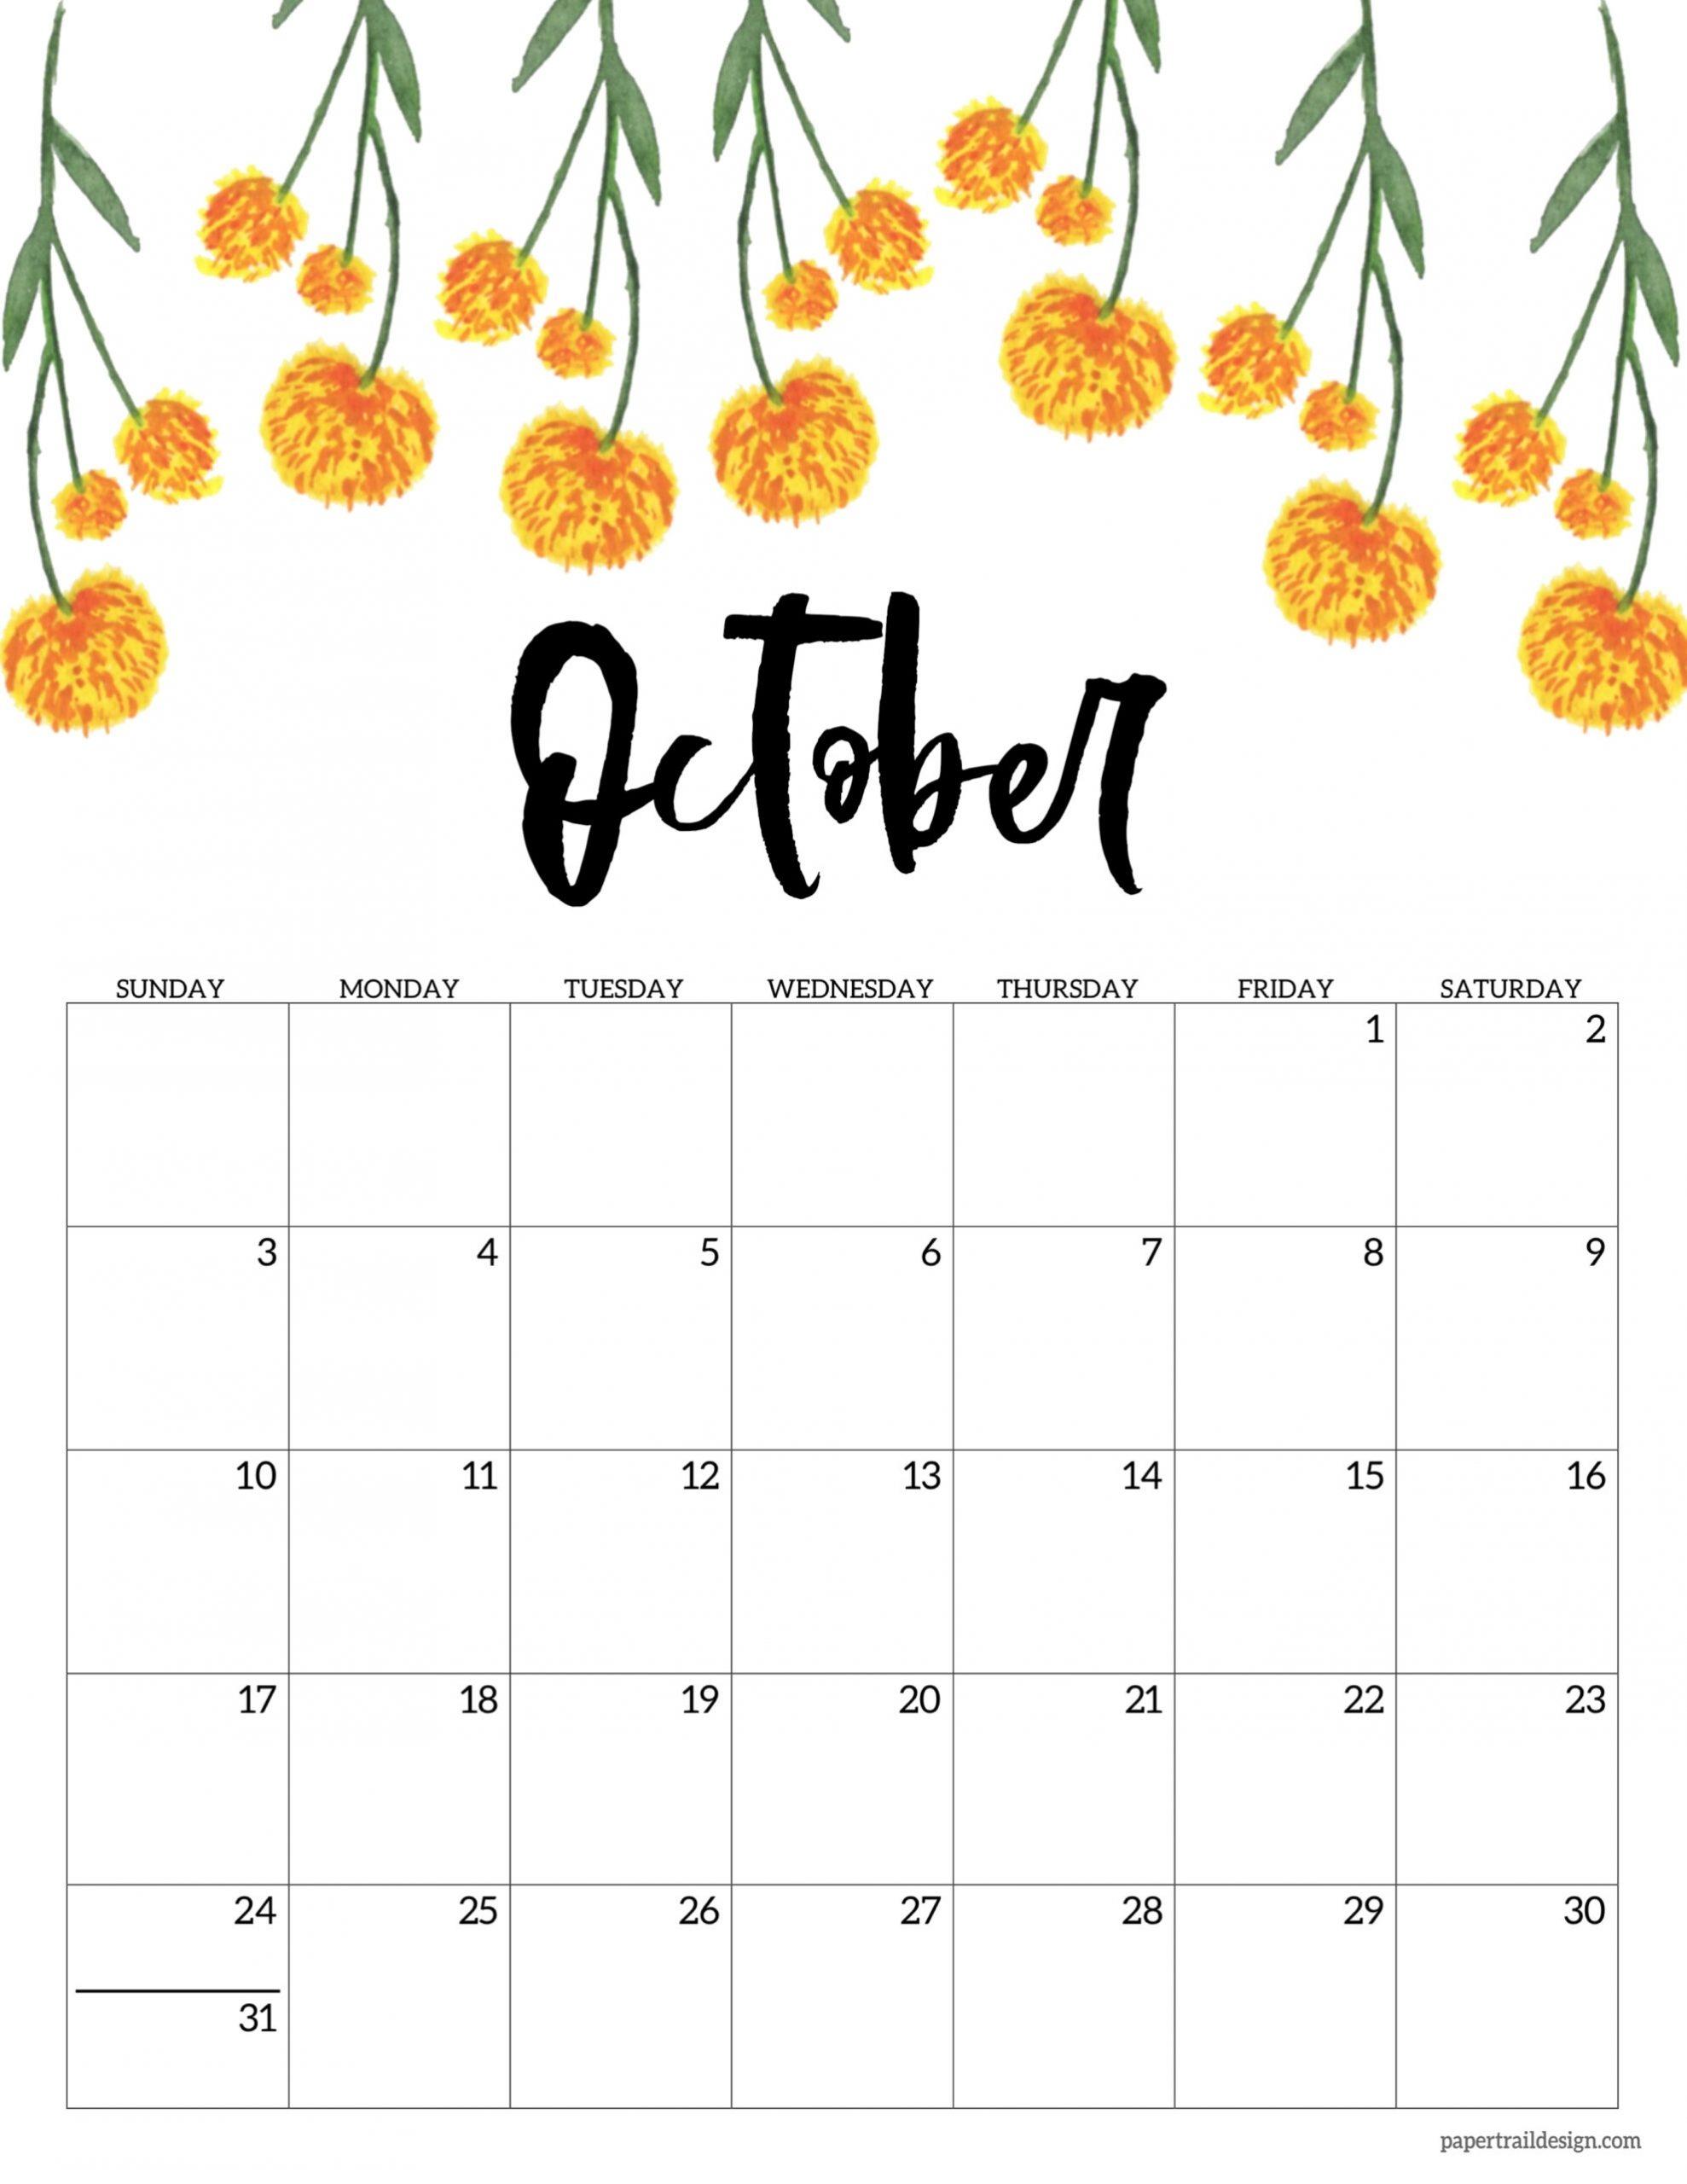 Get Pink August Calendar 2021 Printable